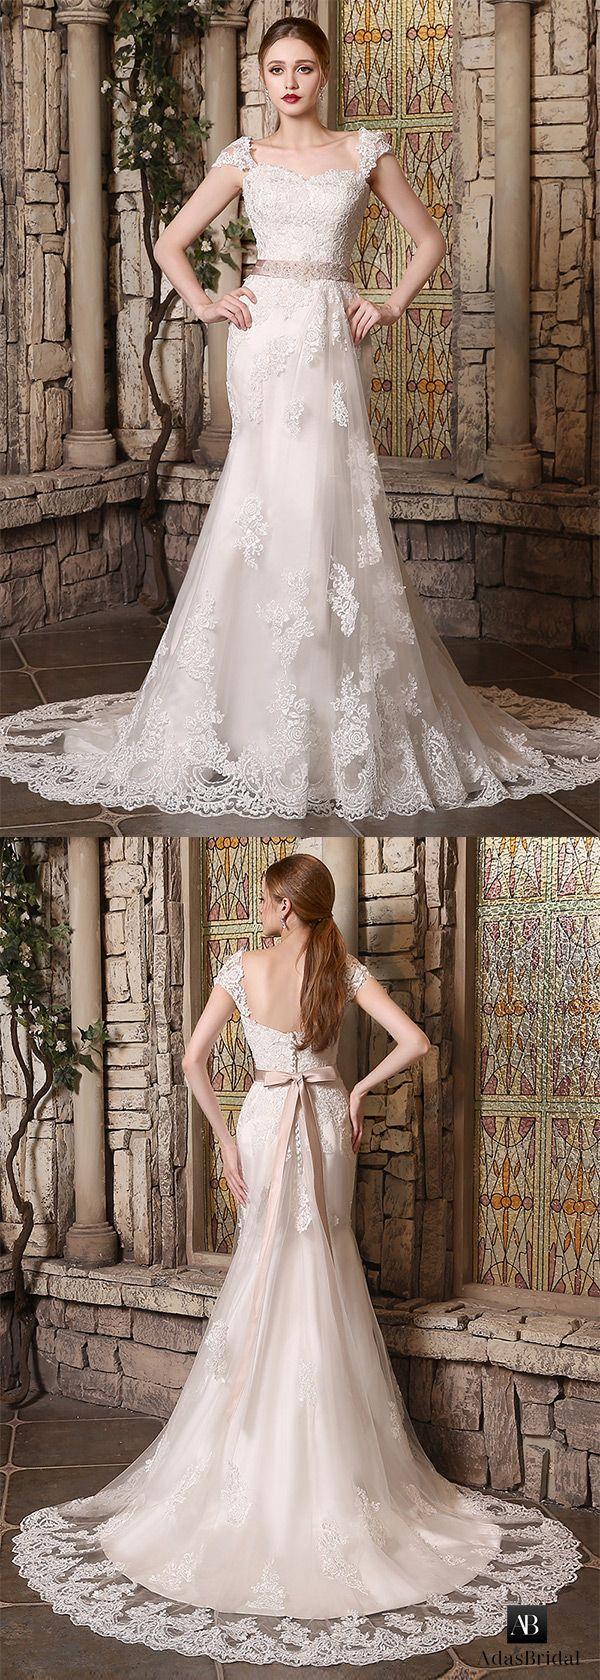 Tulle mermaid wedding dress  Stunning tulle sweetheart neckline mermaid wedding dresses with lace